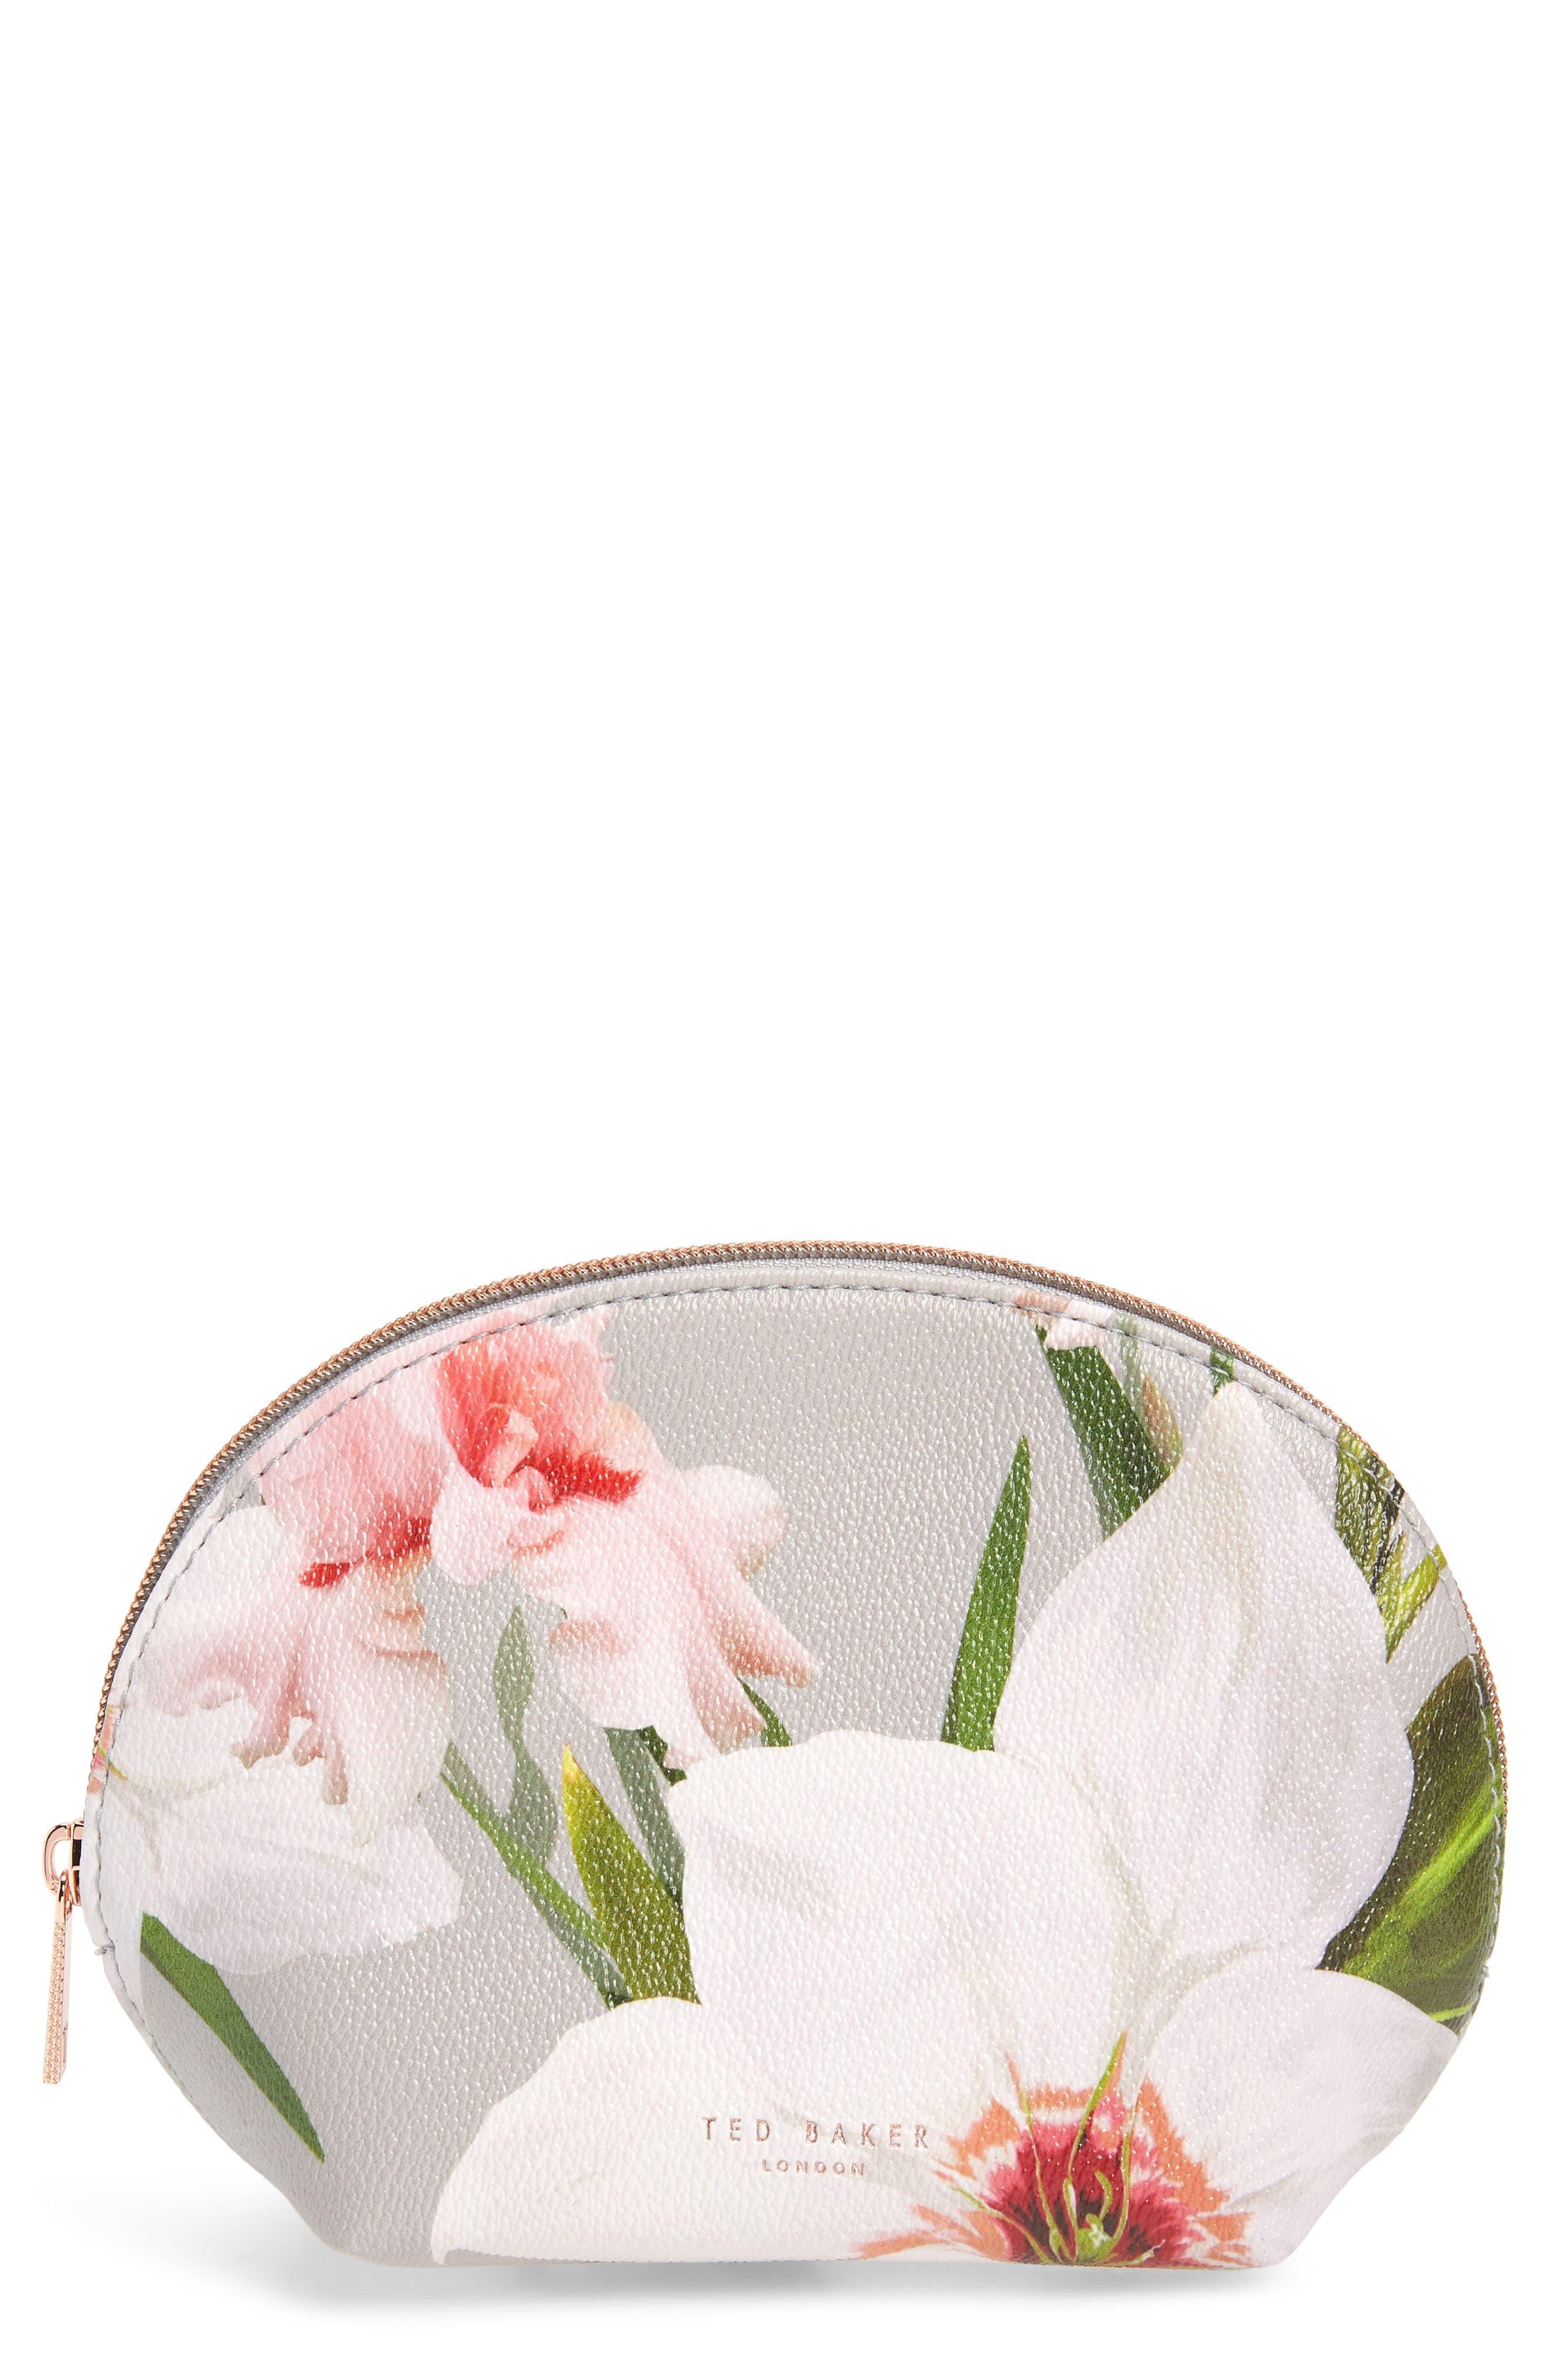 654db9501 Ted Baker Margita Chatsworth Bloom Cosmetic Bag In Mid Grey ...